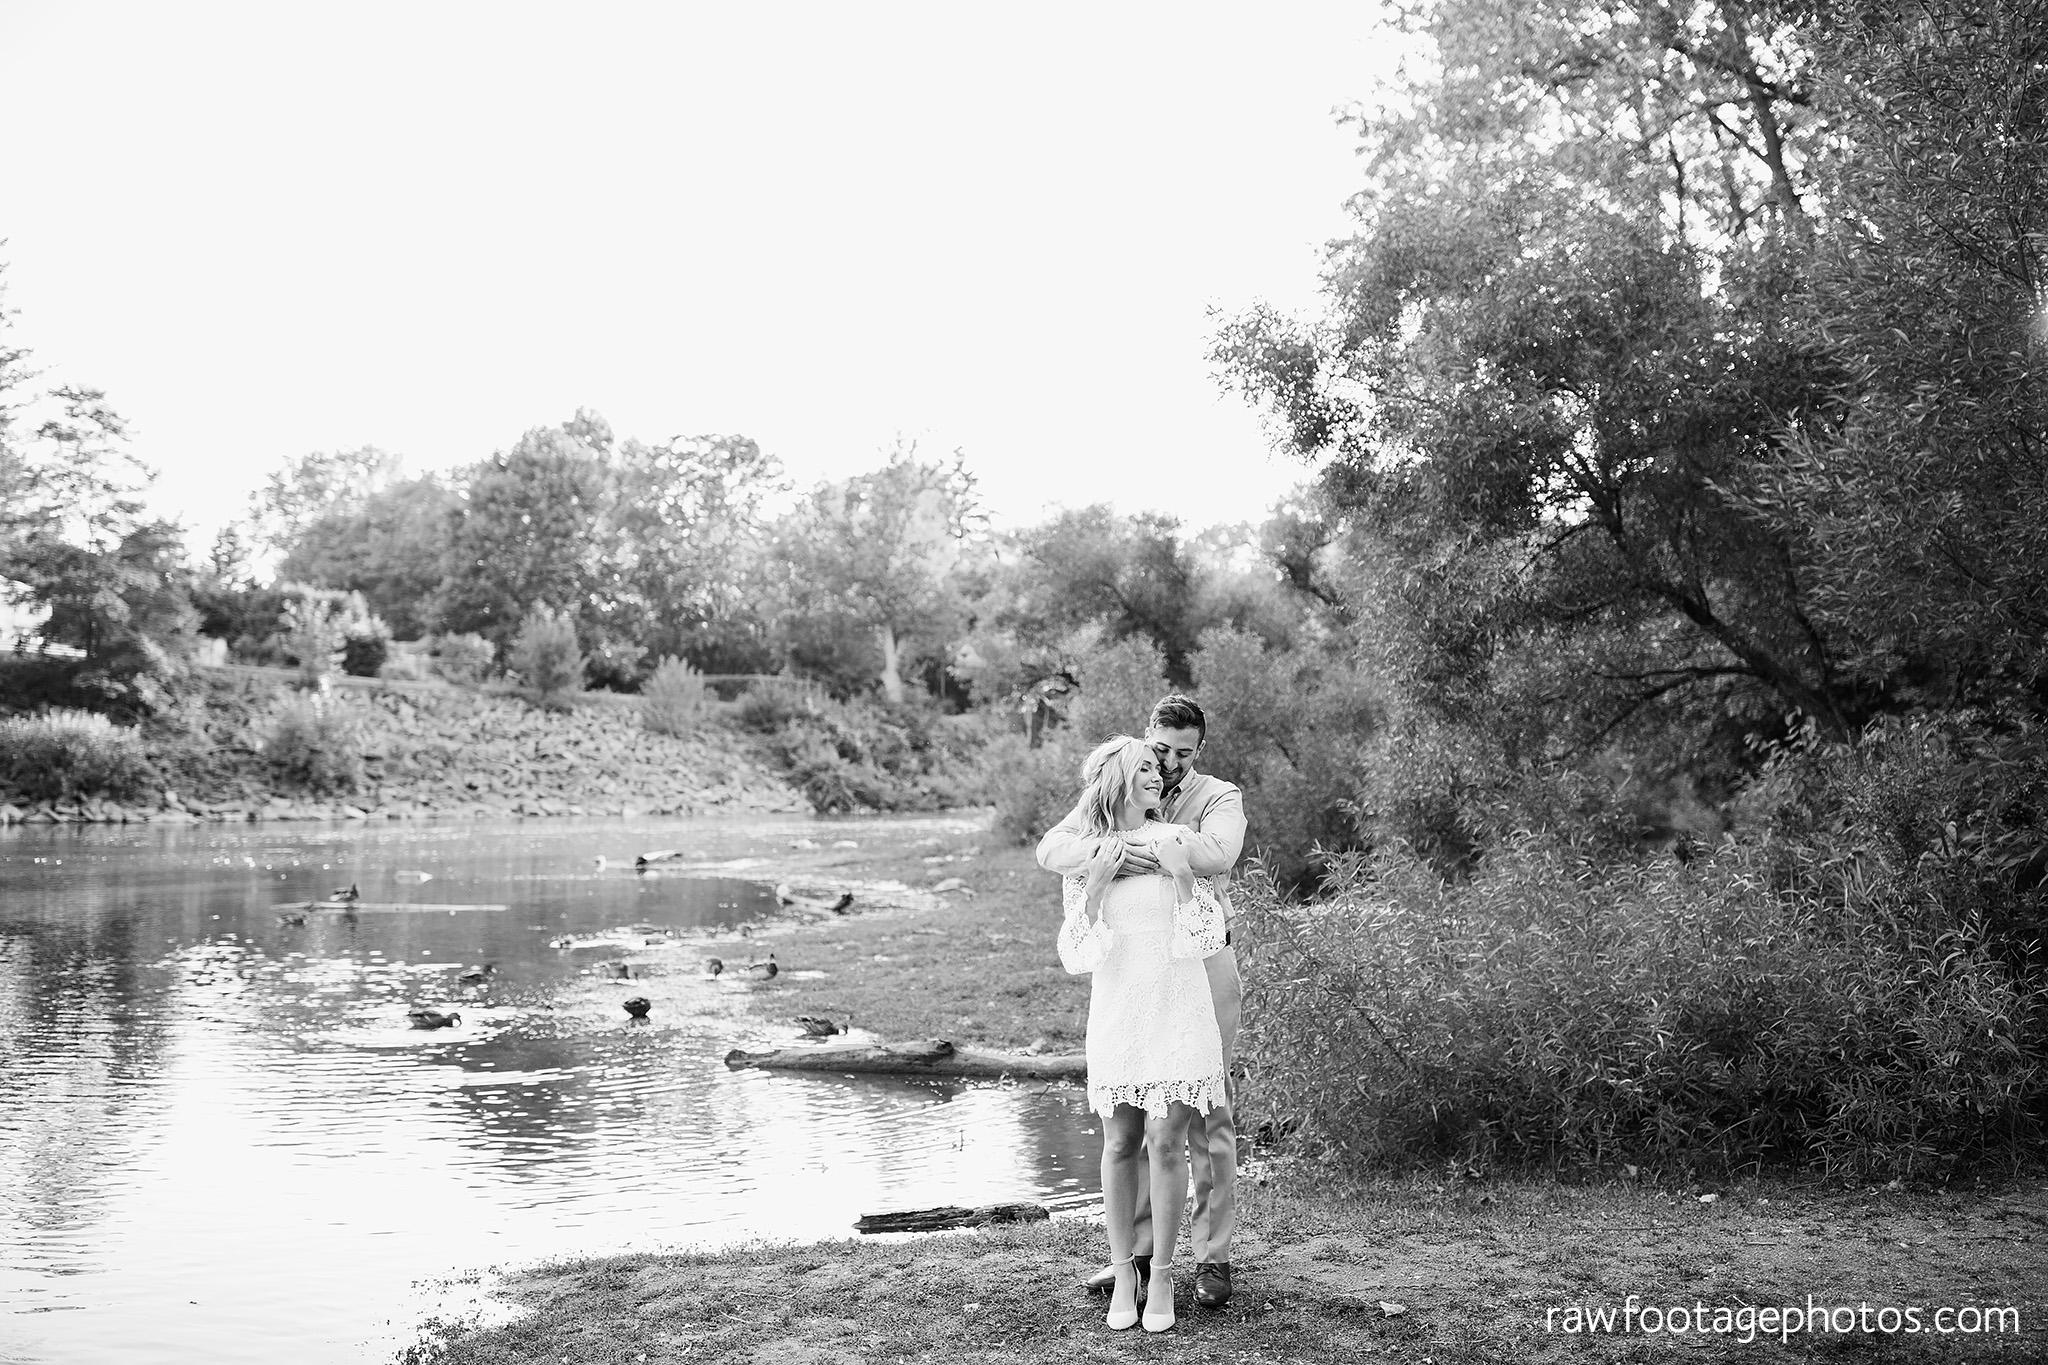 london_ontario_wedding_photographer-raw_footage_photography-engagement_session-uwo-campus-gibbons_park-woods016.jpg